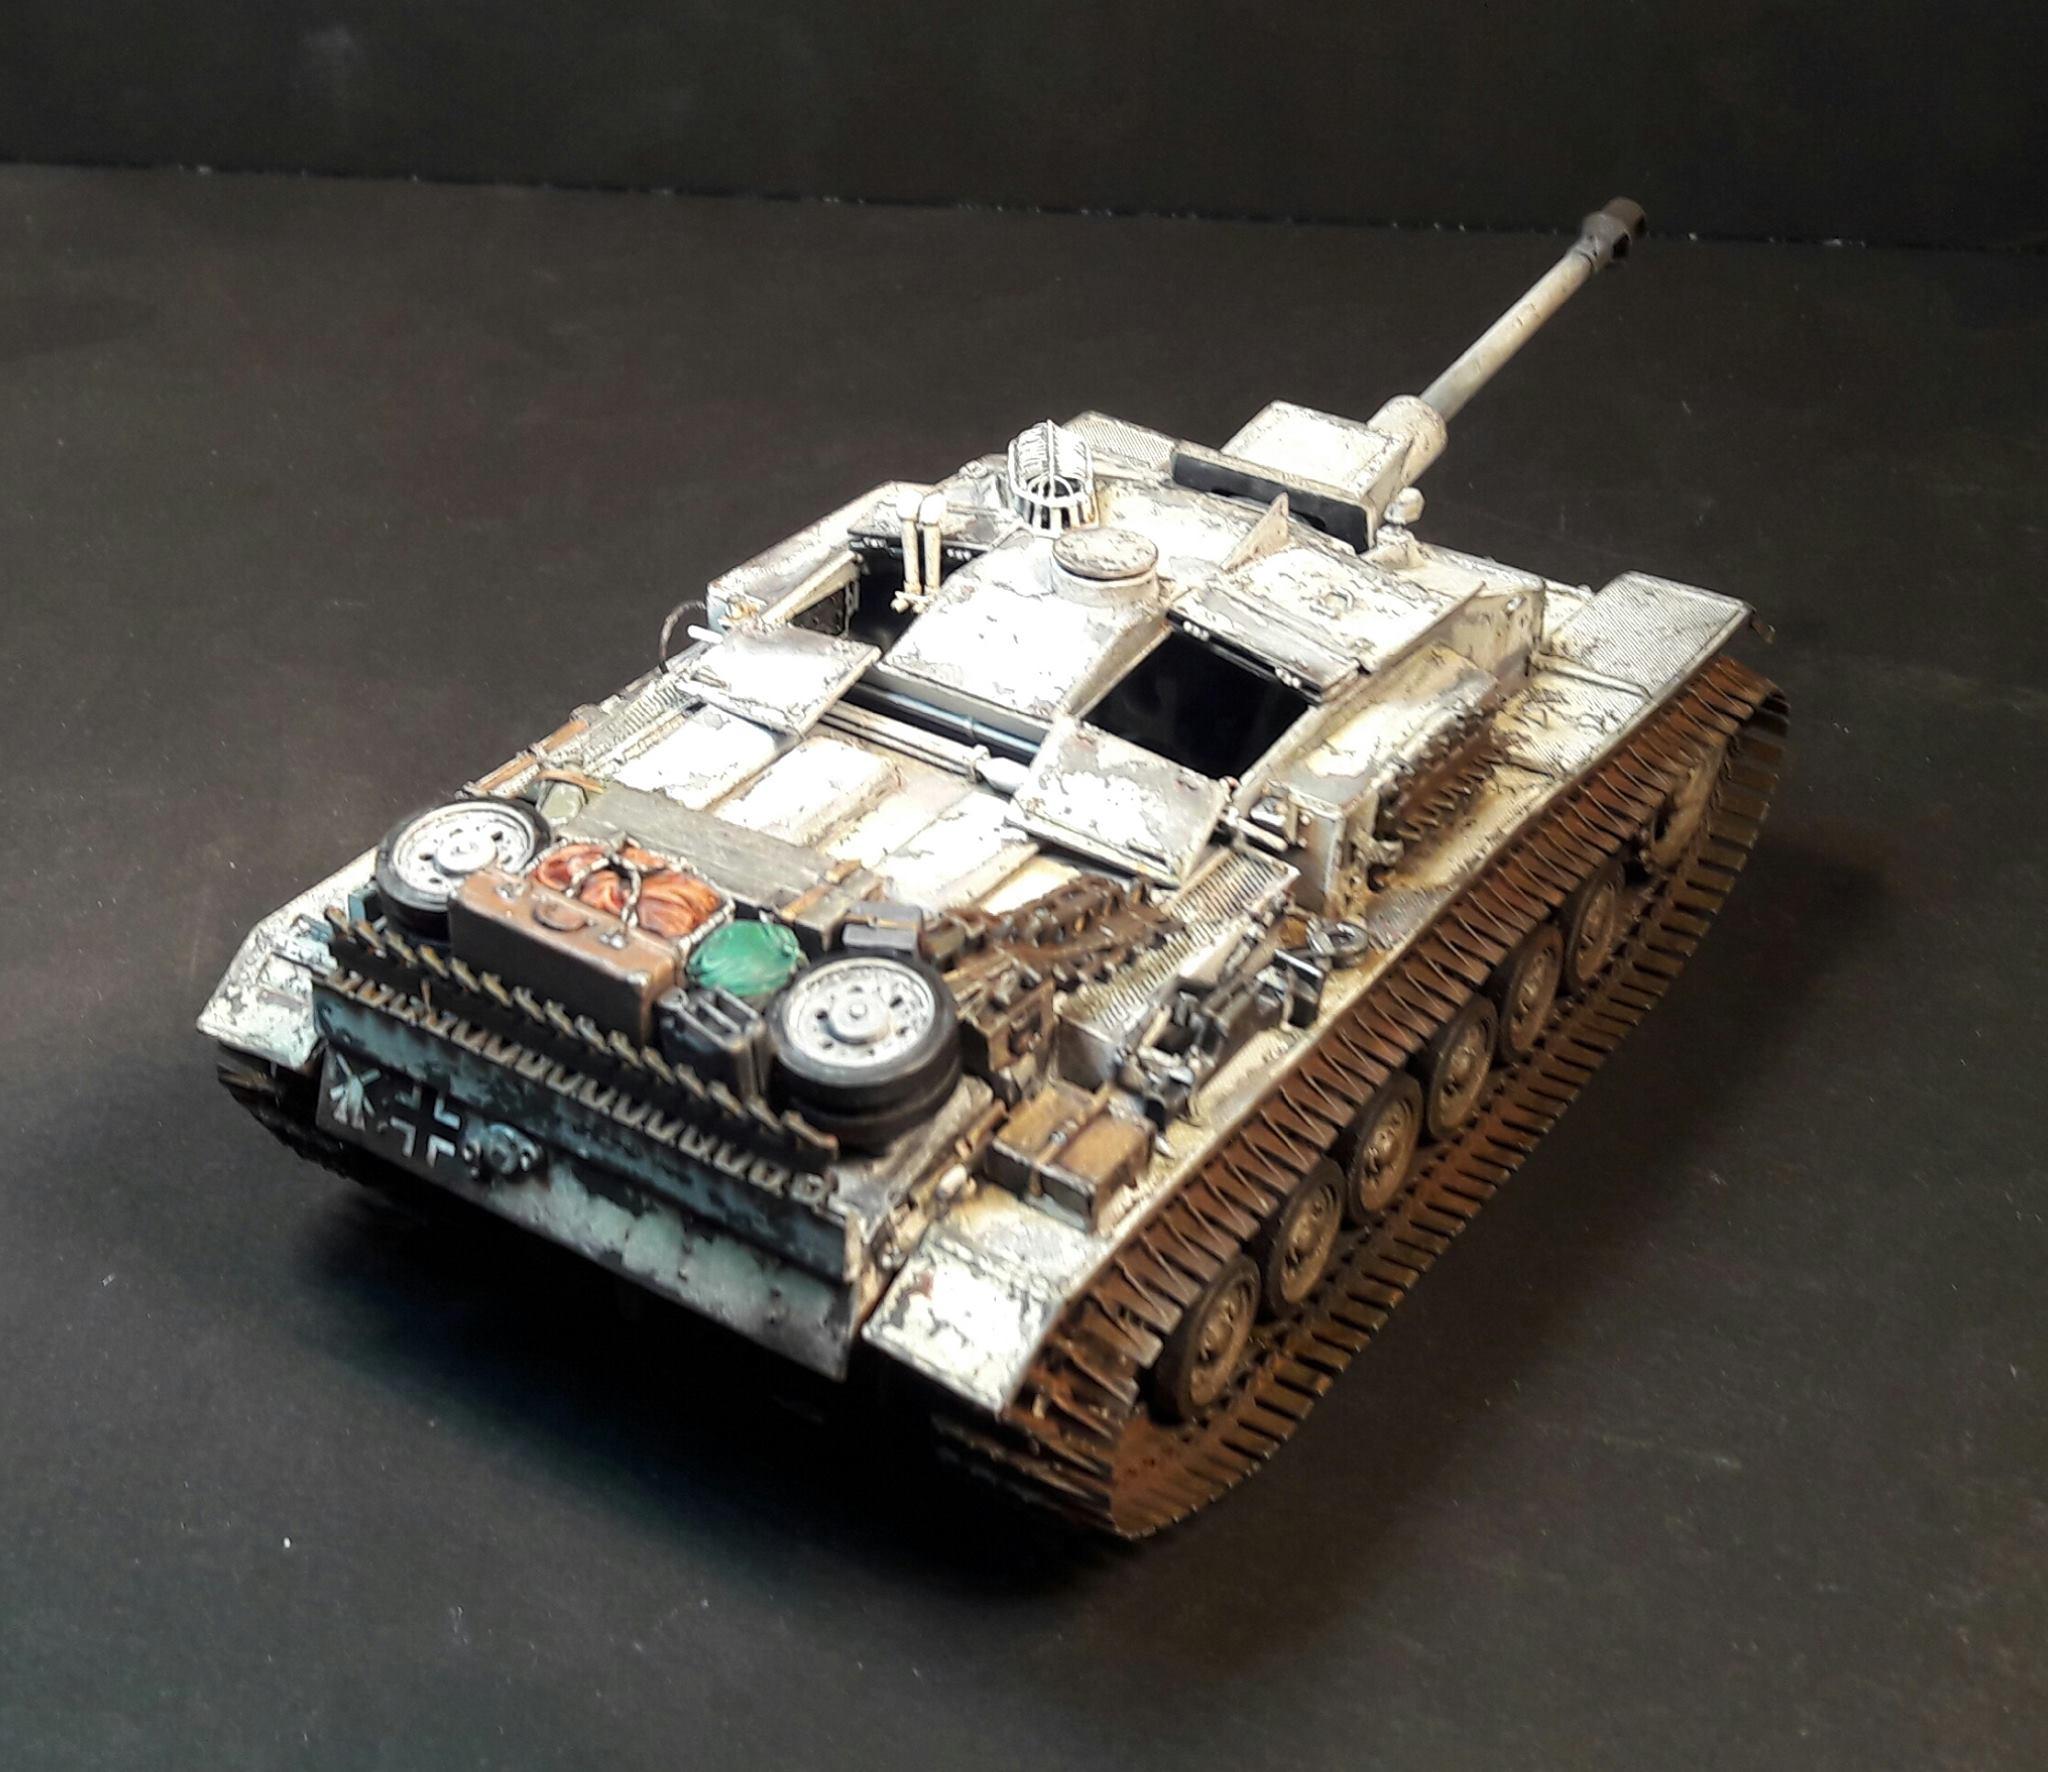 StuG.III Ausf.F/8 late production w/Winterketten - 1/35 - Page 2 26668820930303102120985114325881005210834o